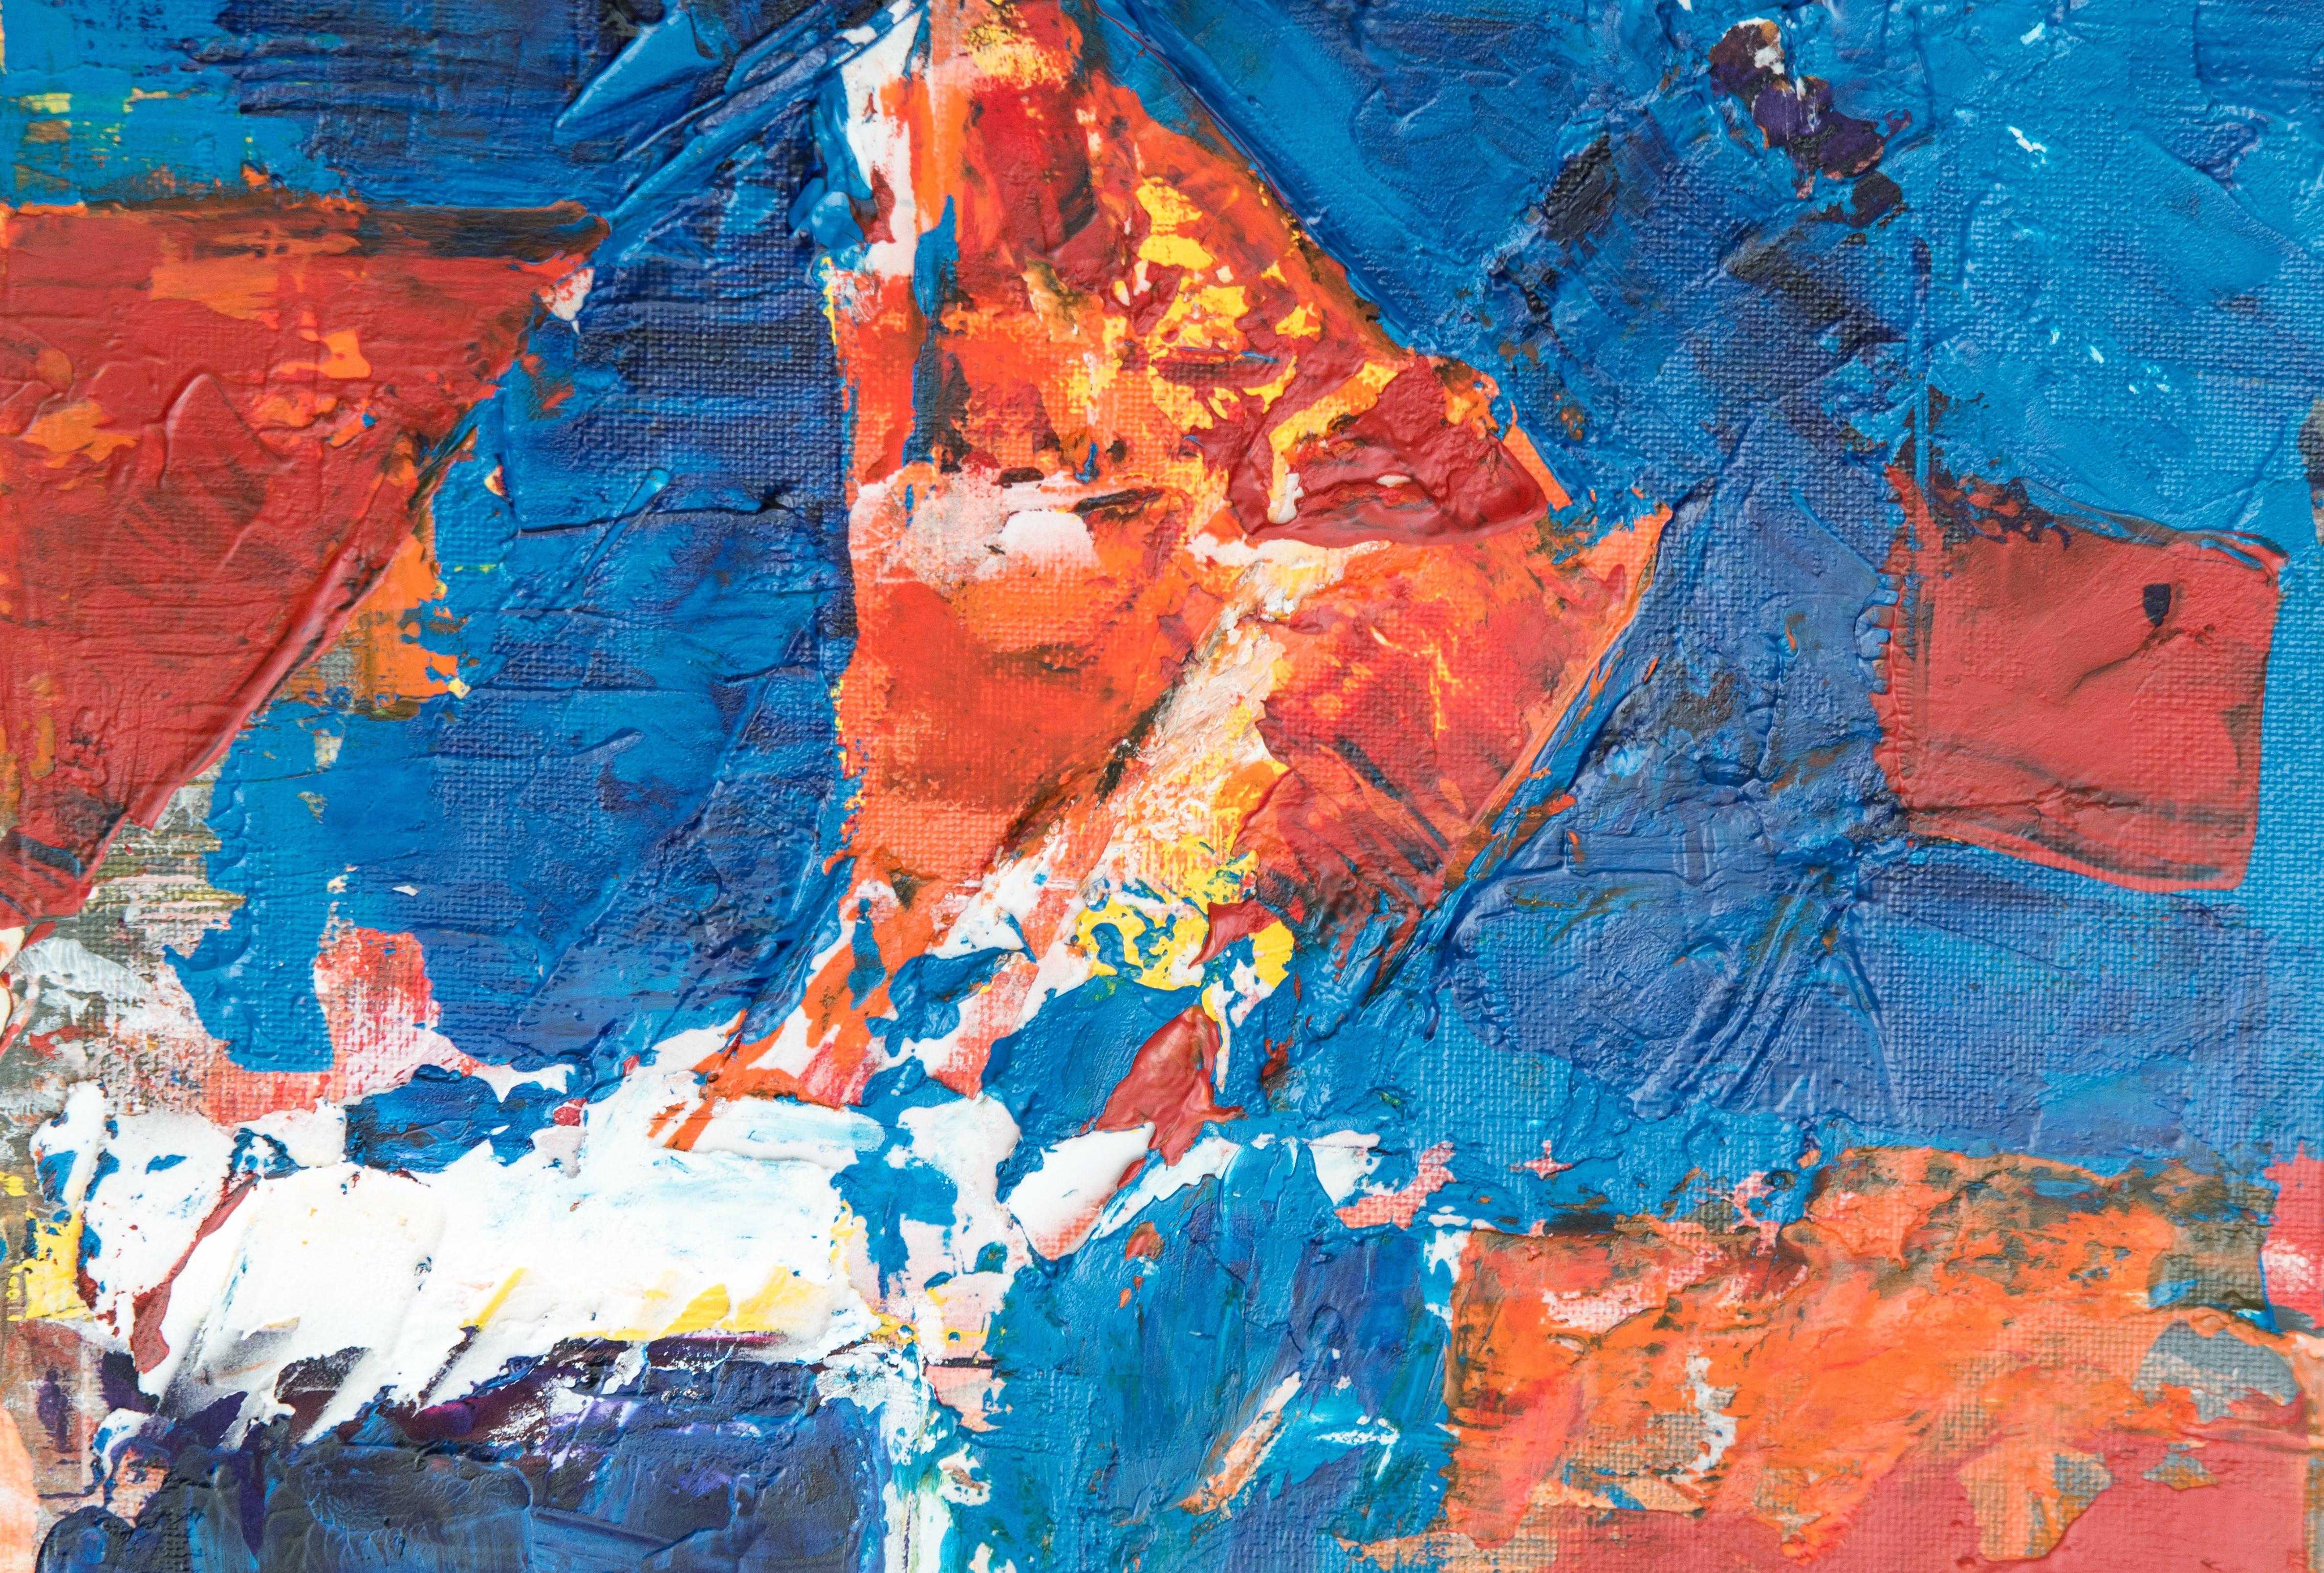 Kostenloses Stock Foto zu abstrakt, abstrakter expressionismus, abstraktes gemälde, acrylfarbe